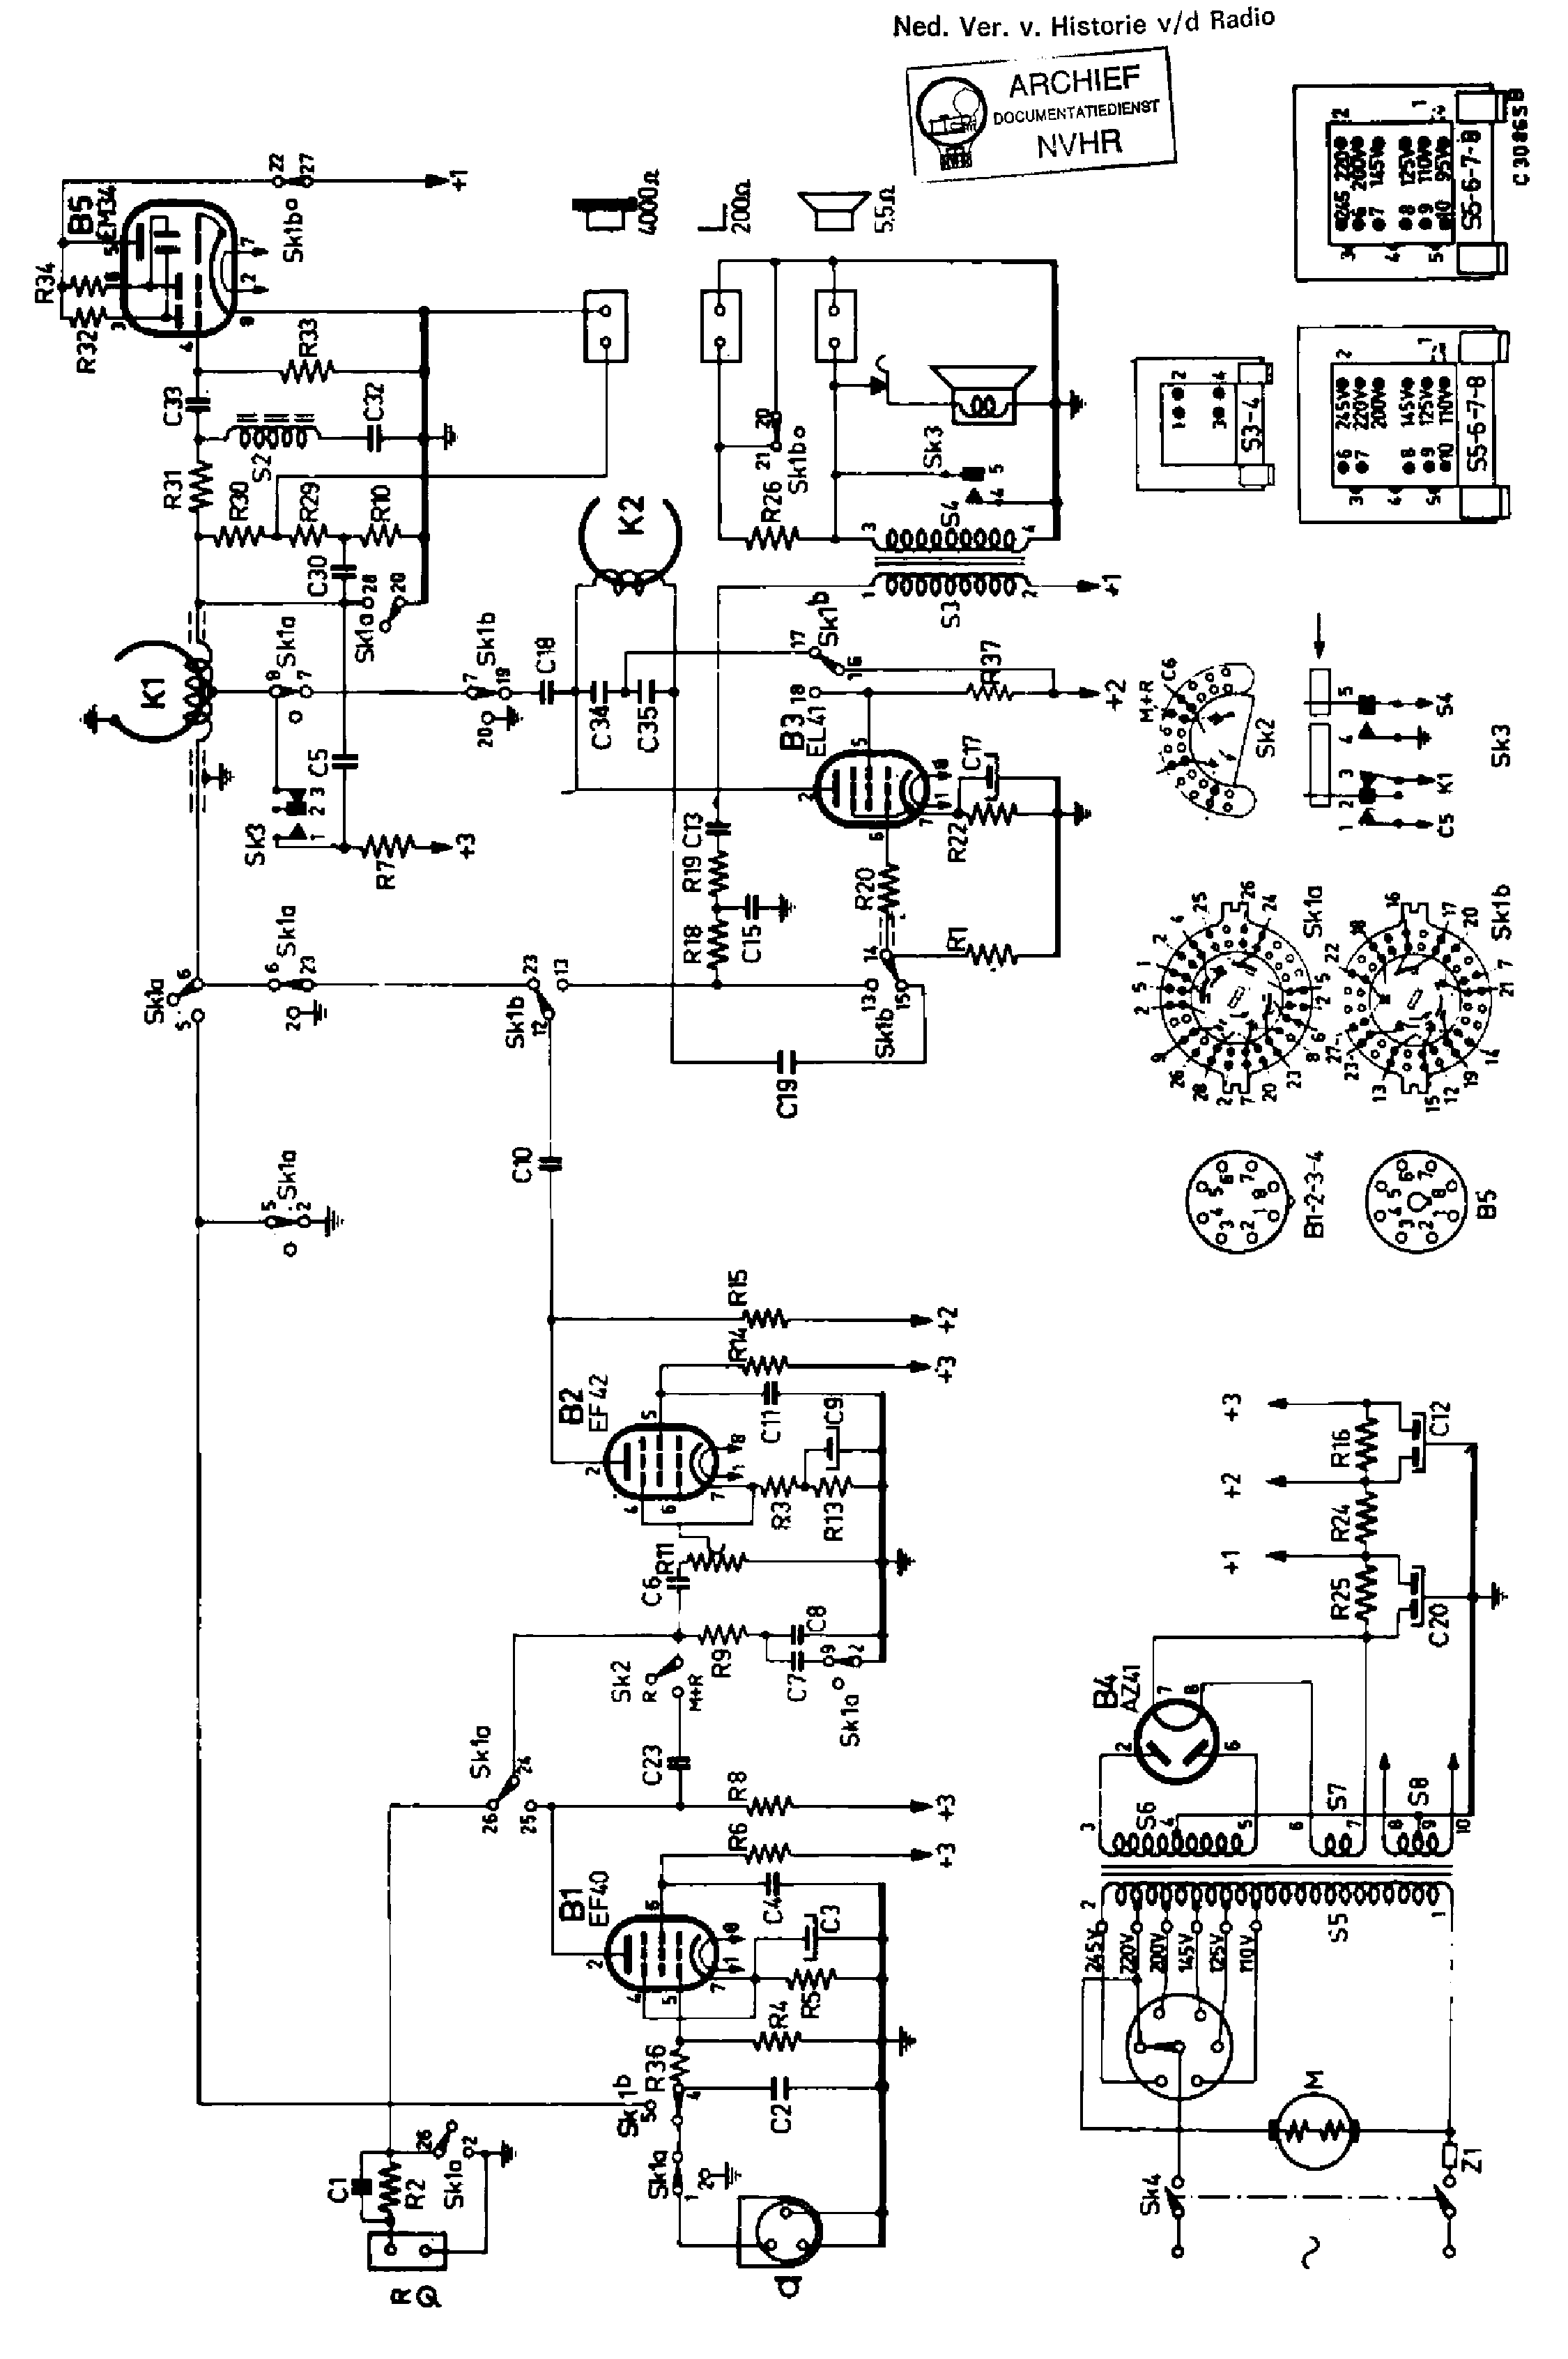 philips ga212 sm service manual free download  schematics